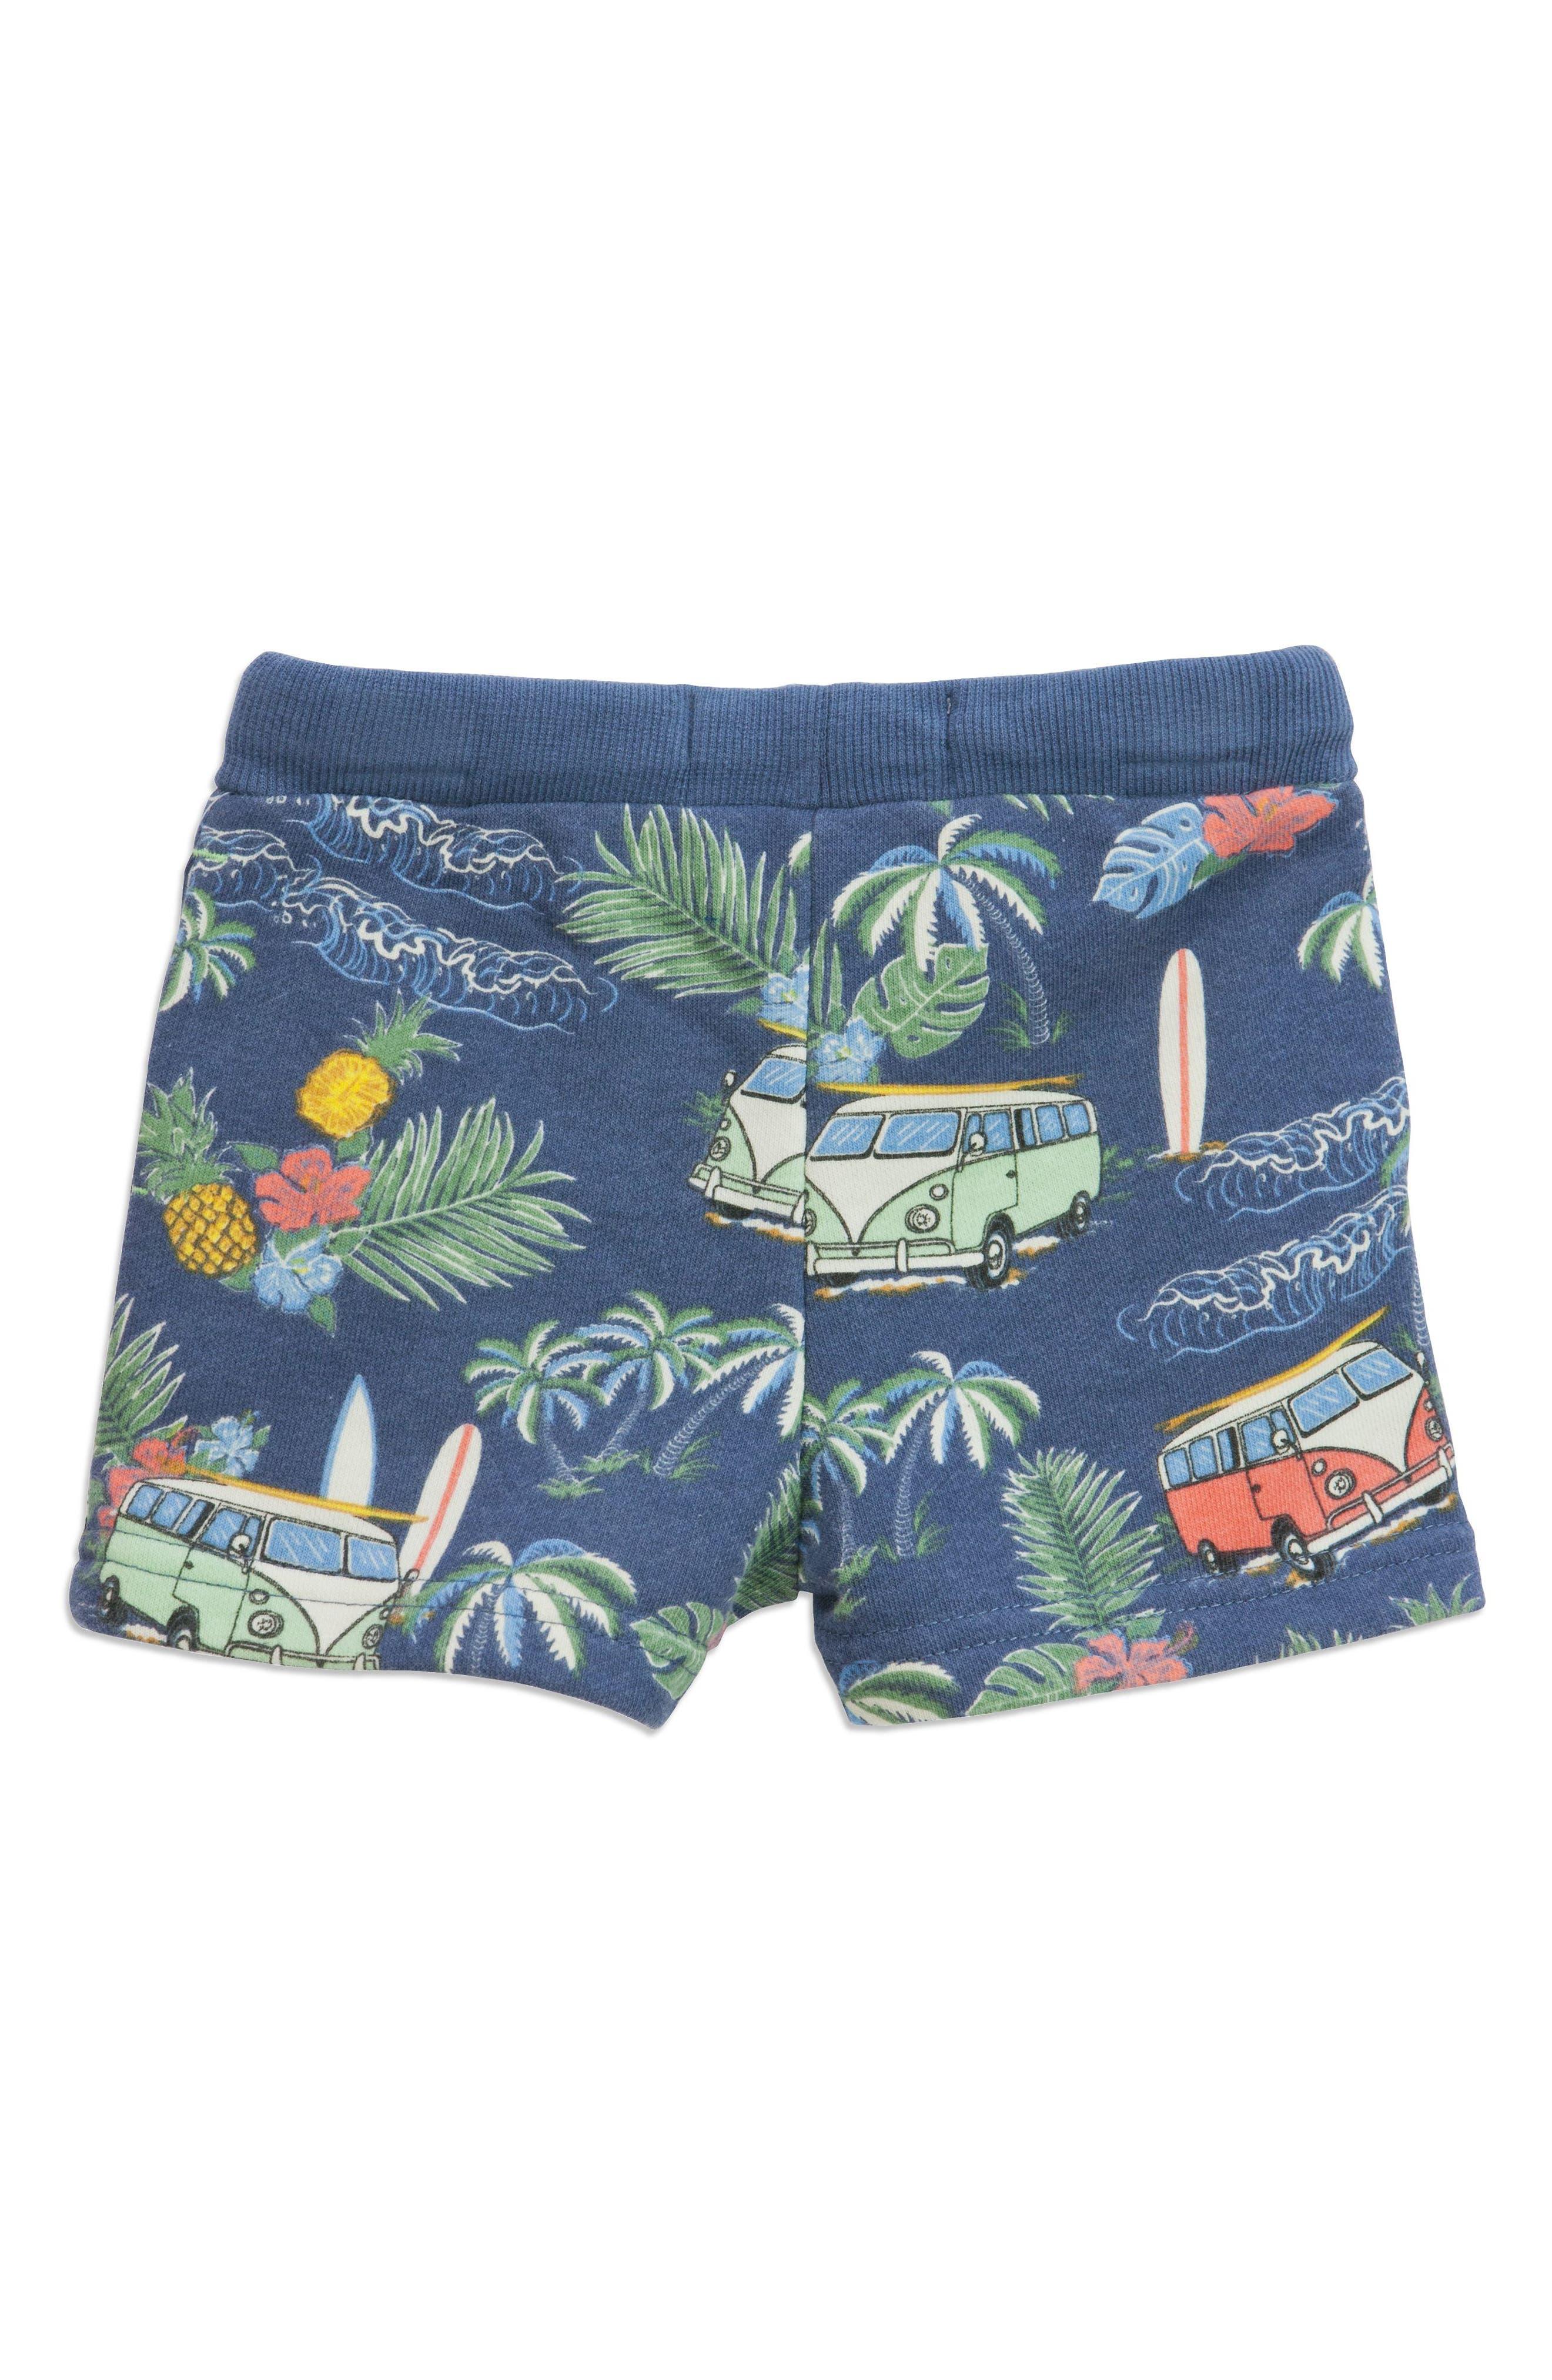 Summer Vacay Adriel Knit Shorts,                             Alternate thumbnail 2, color,                             410